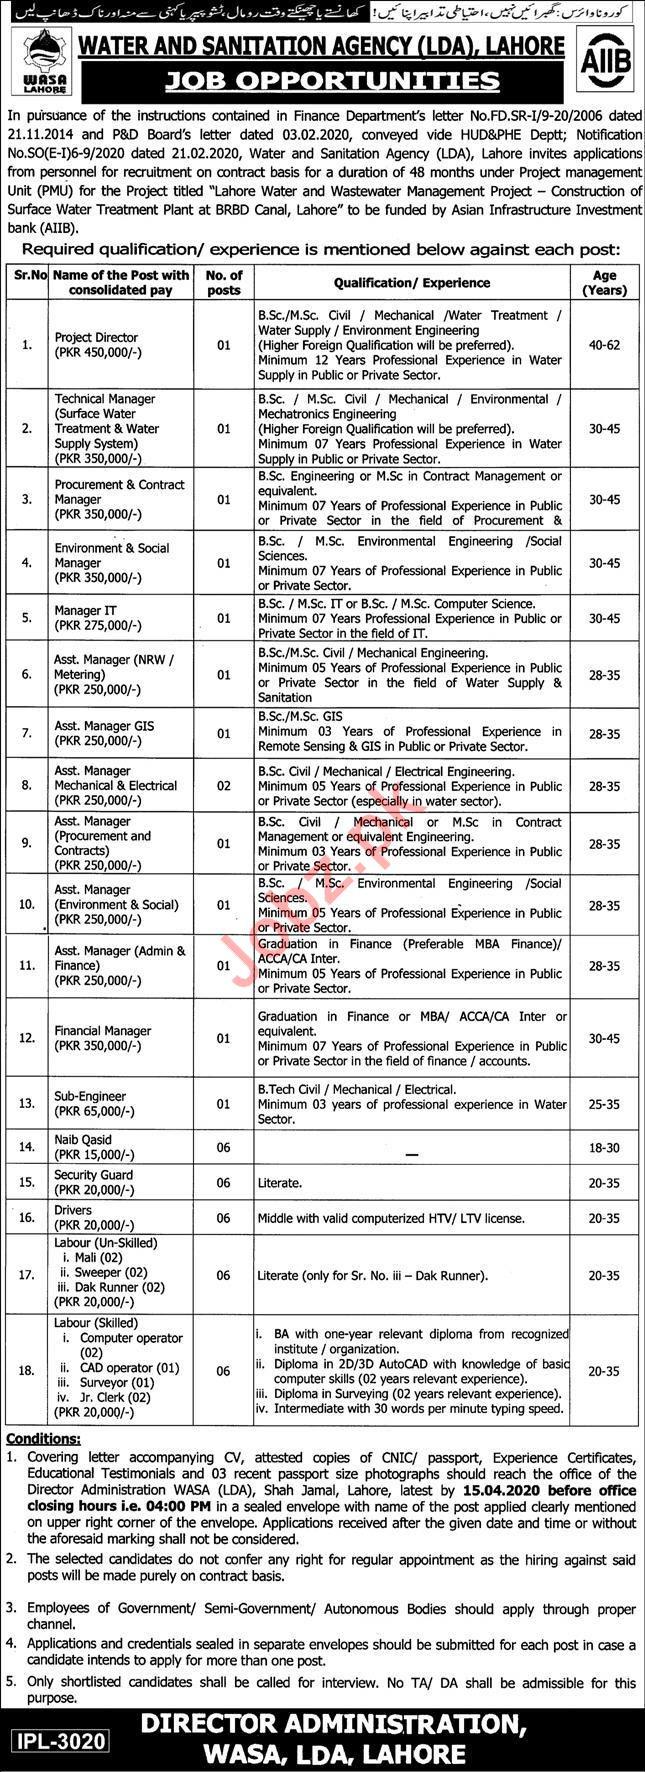 Water and Sanitation Agency WASA Jobs 2020 in Lahore